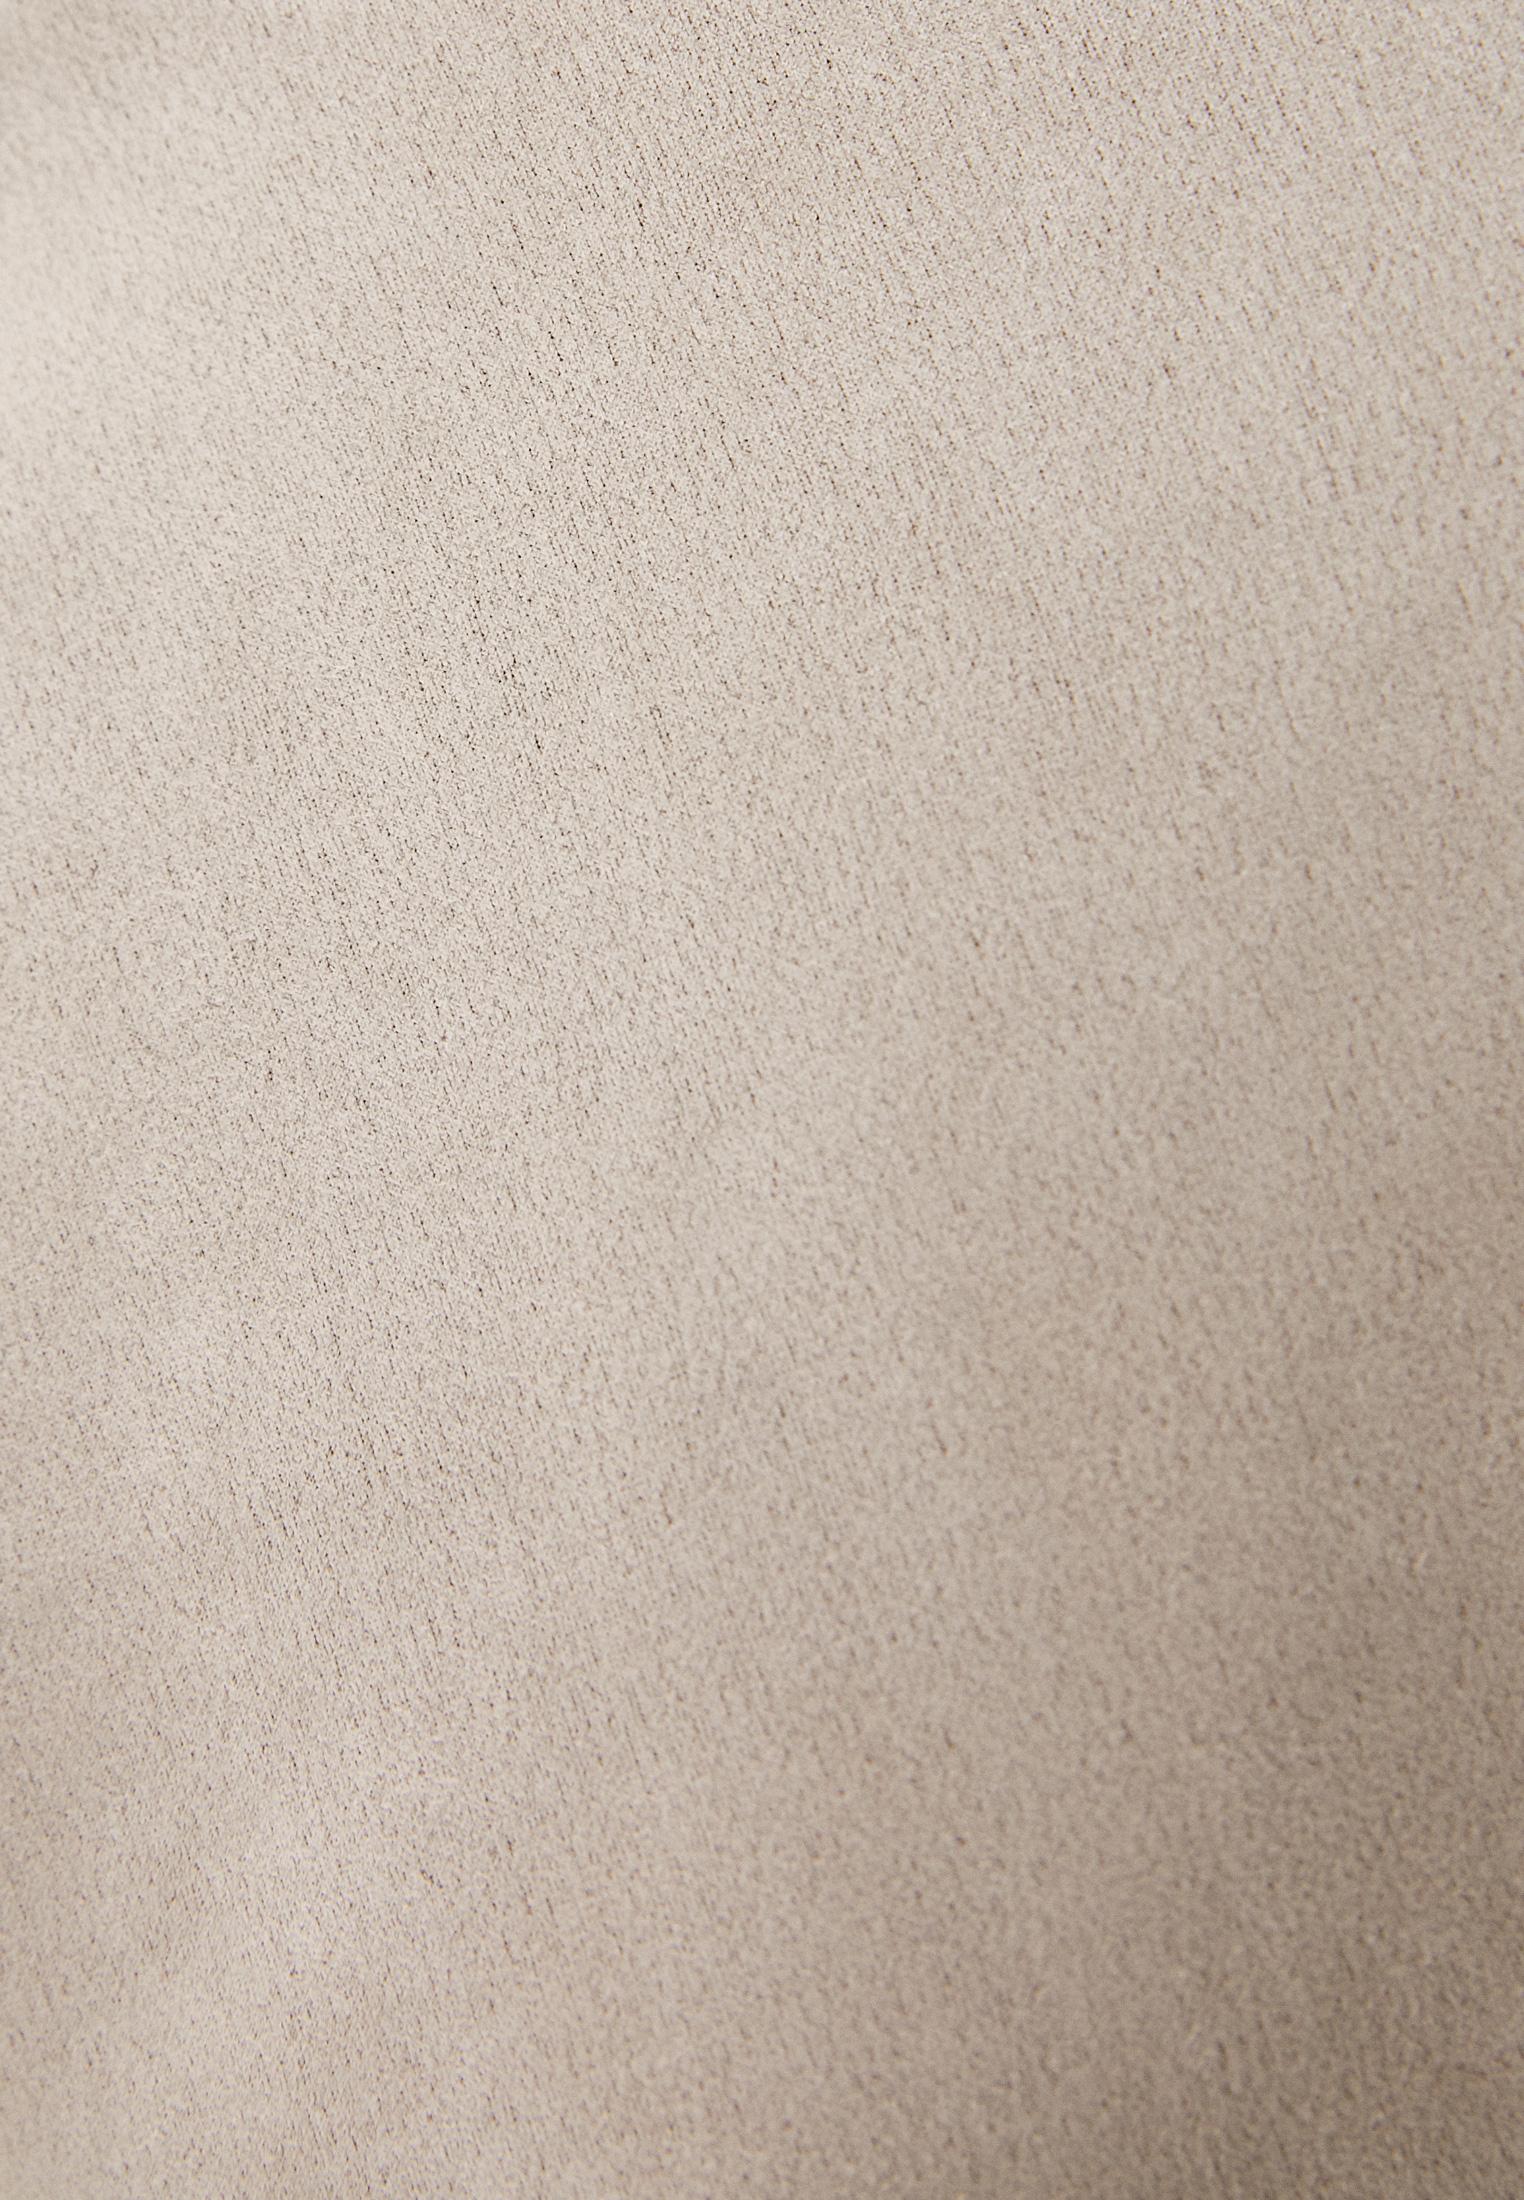 Костюм с брюками Nerouge N1254-1: изображение 4